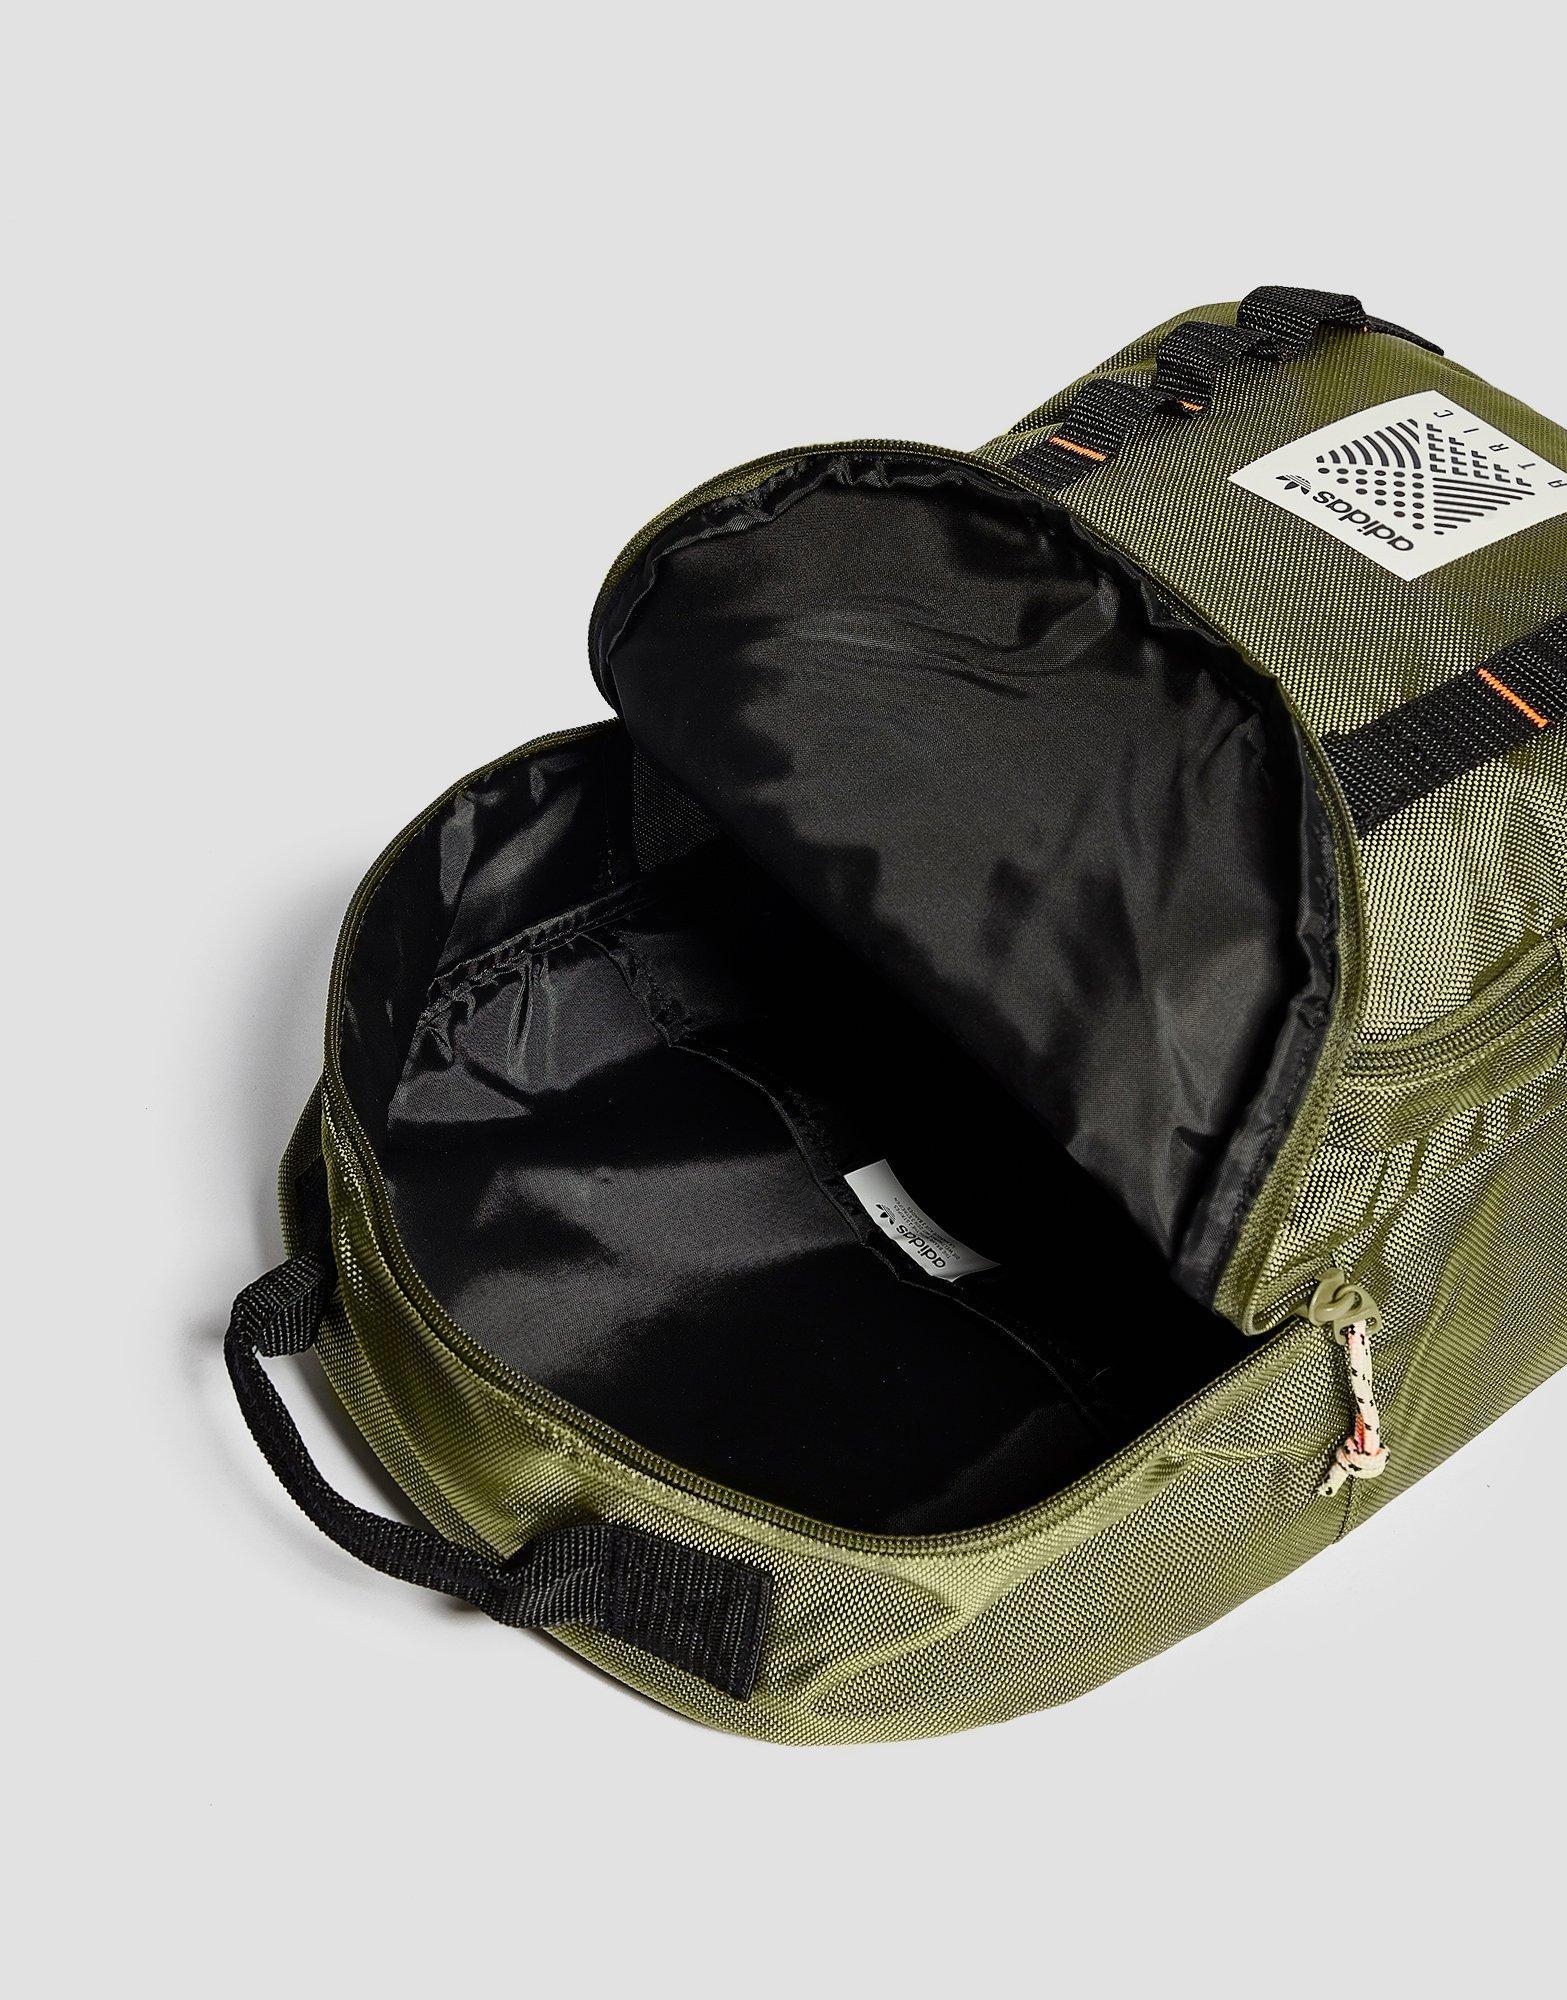 f20e2f1bdde0 adidas Originals Classic Atric Backpack in Green for Men - Lyst